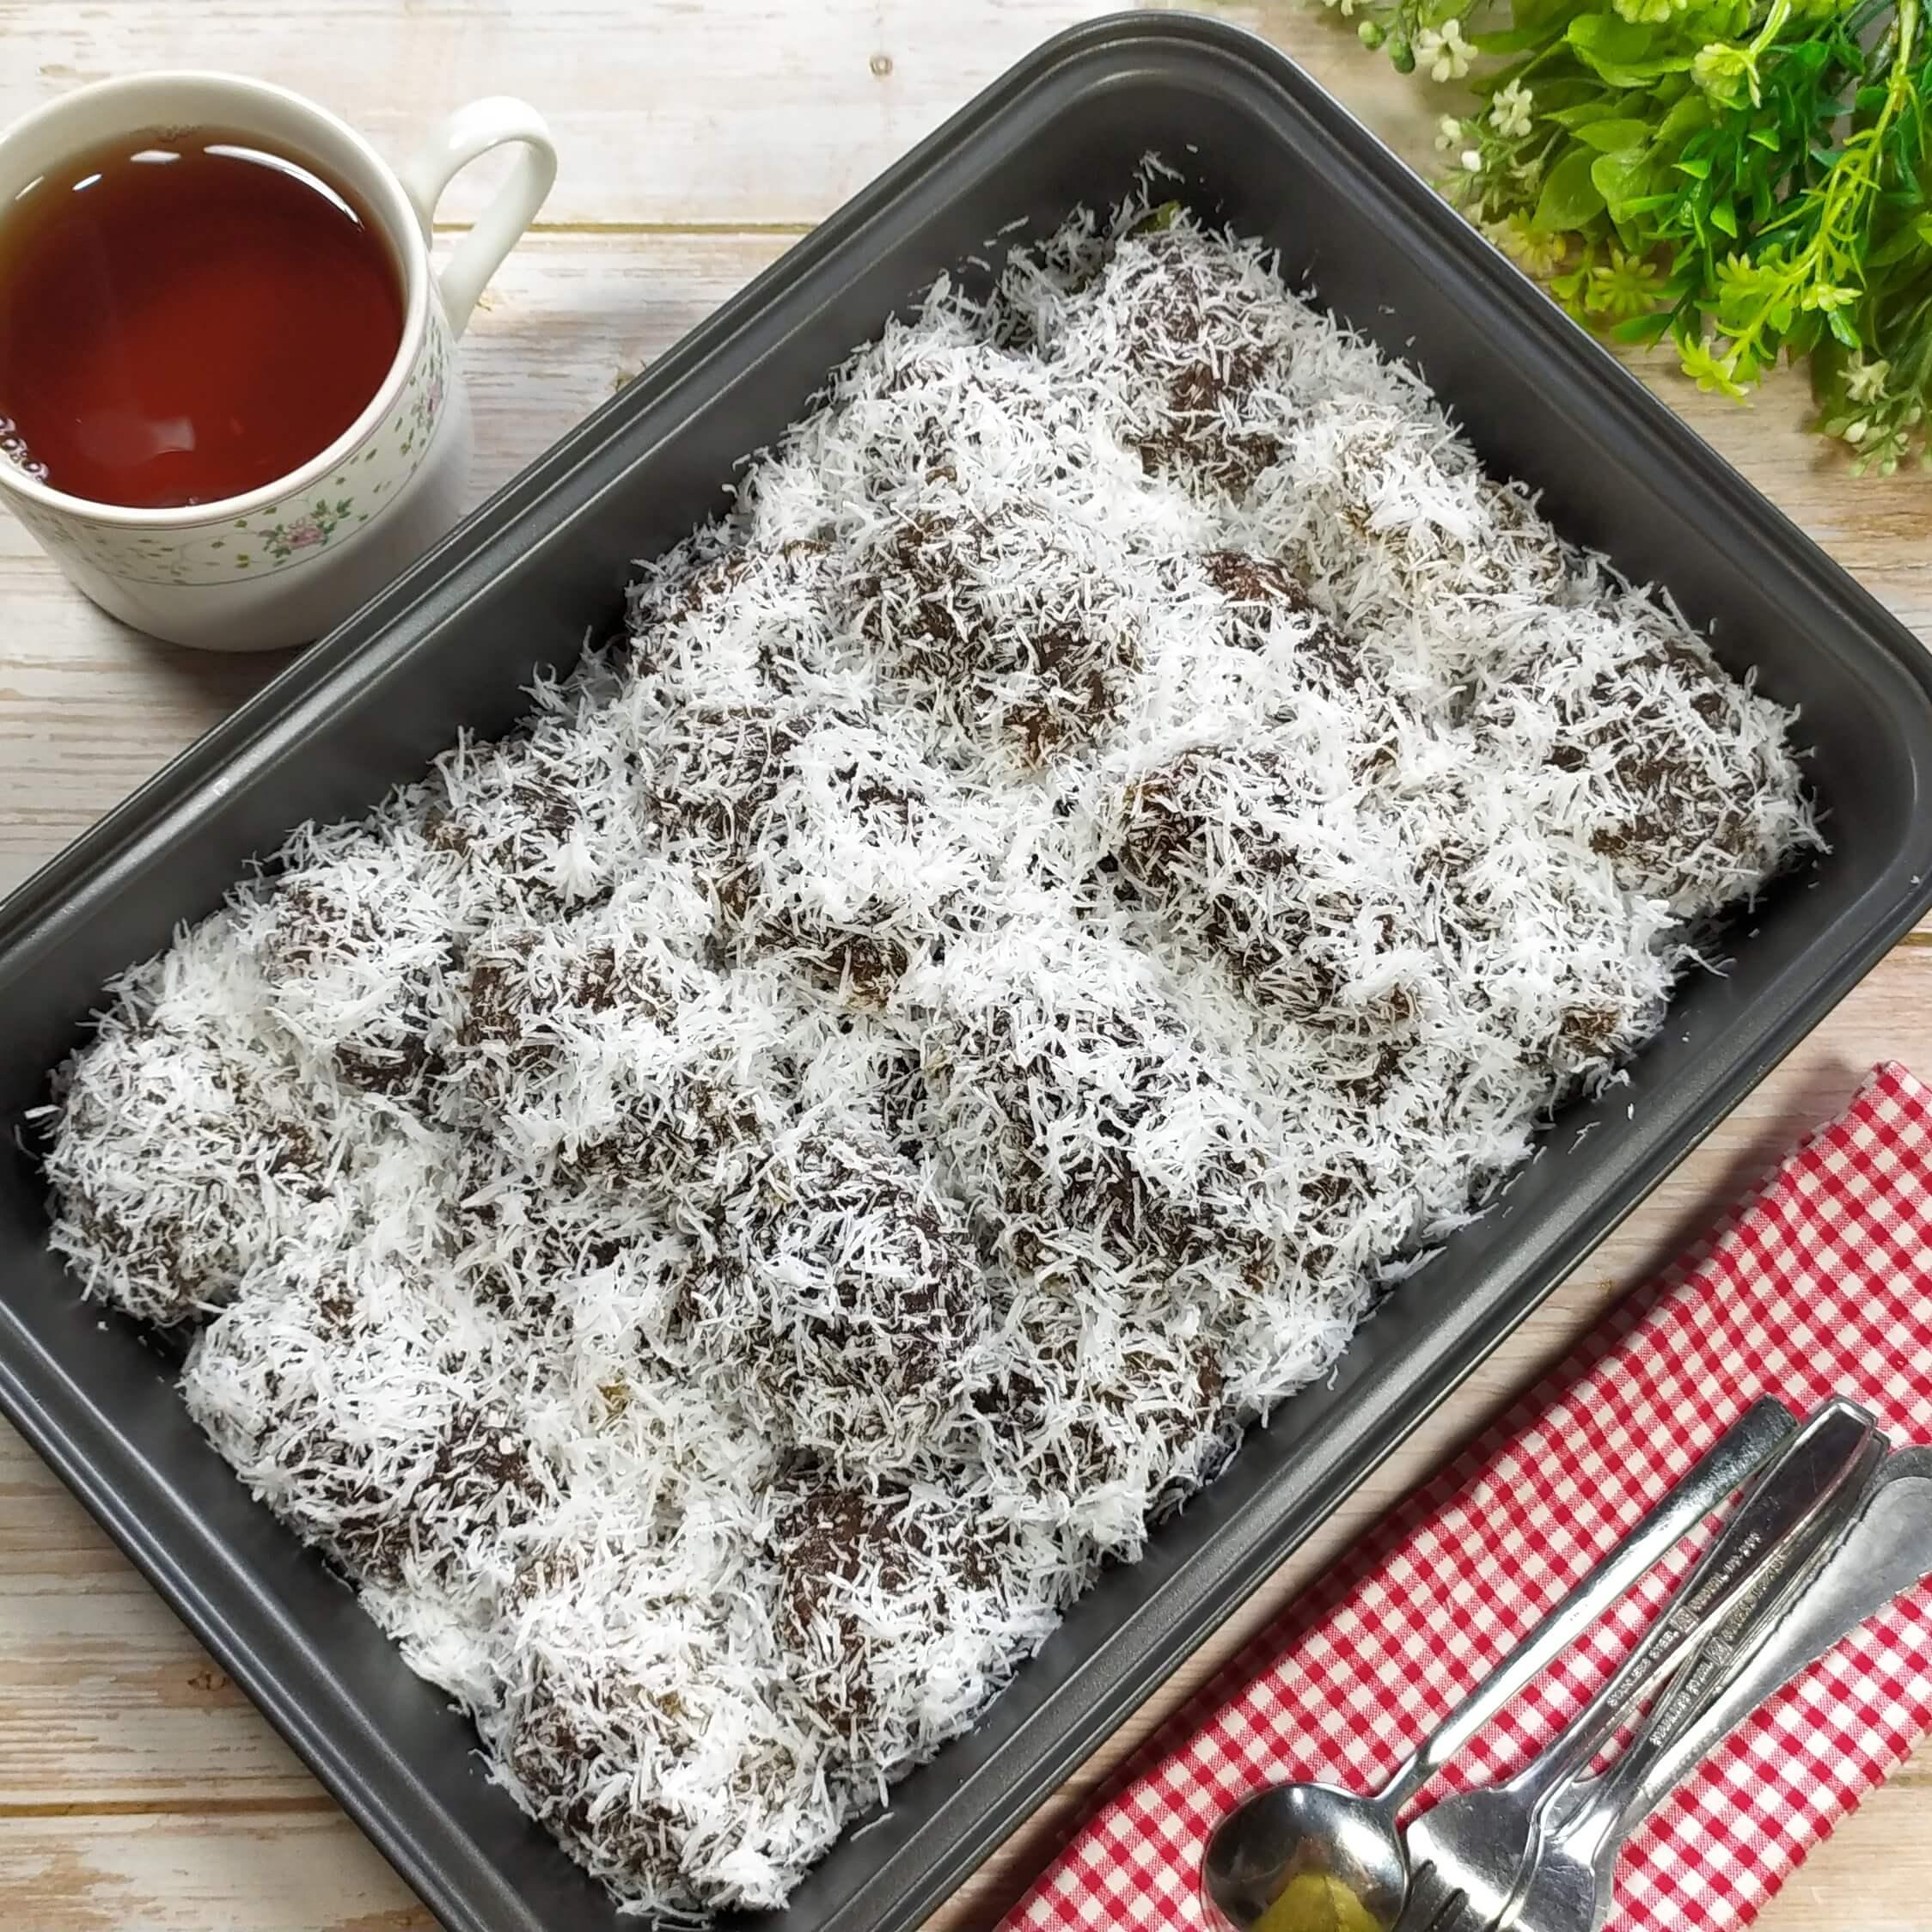 resep ongol ongol tepung tapioka kenyal dan lembut, resep ongol ongol untuk jualan